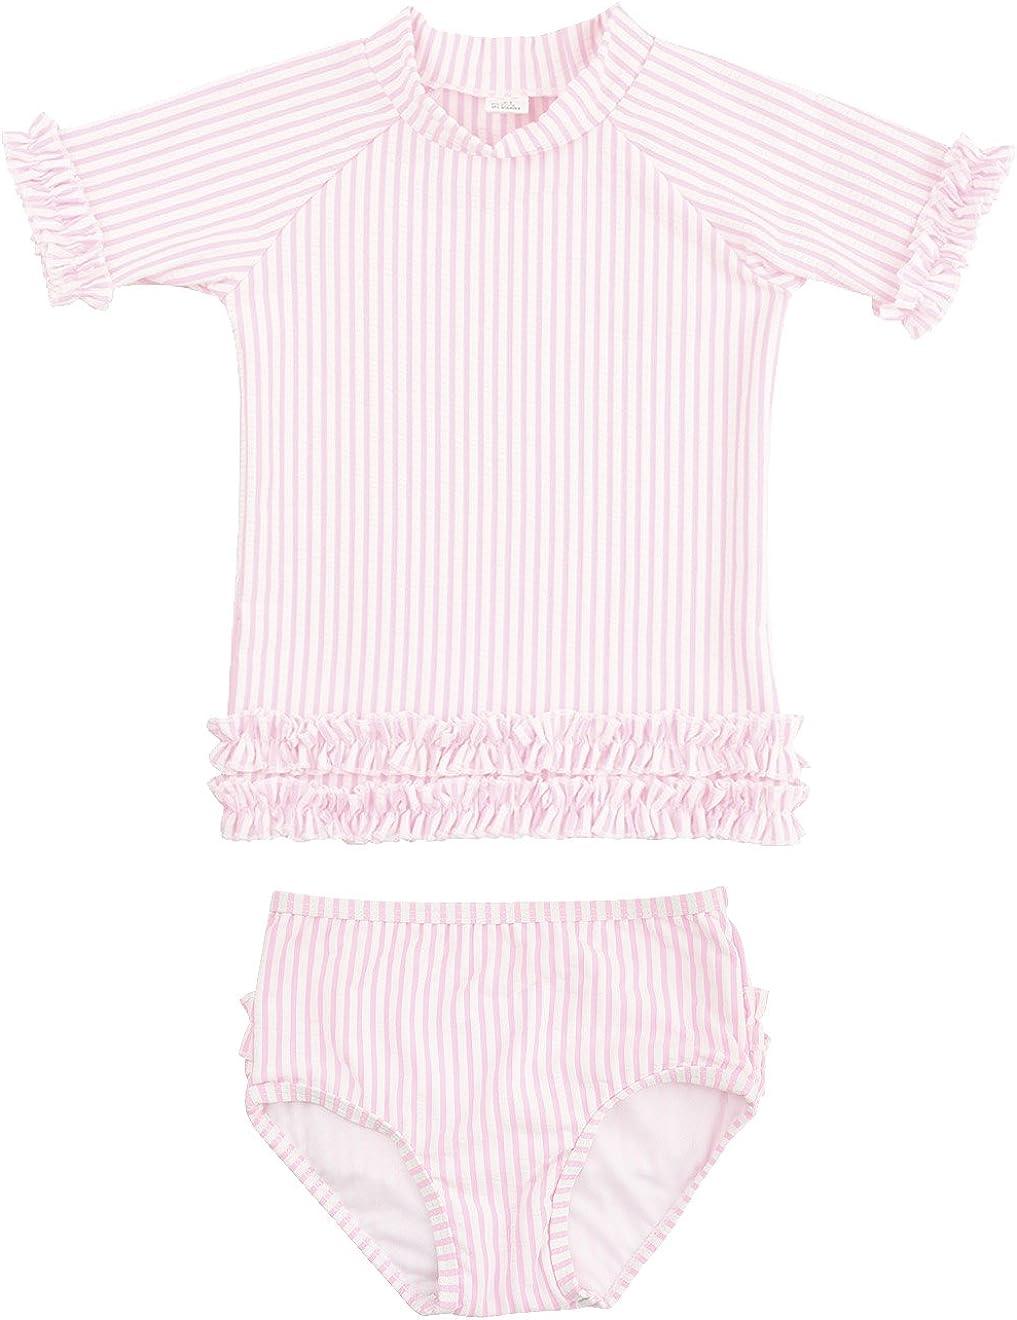 Sun Protection RuffleButts Baby//Toddler Girls Seersucker Rash Guard 2-Piece Short Sleeve Swimsuit Set with UPF 50